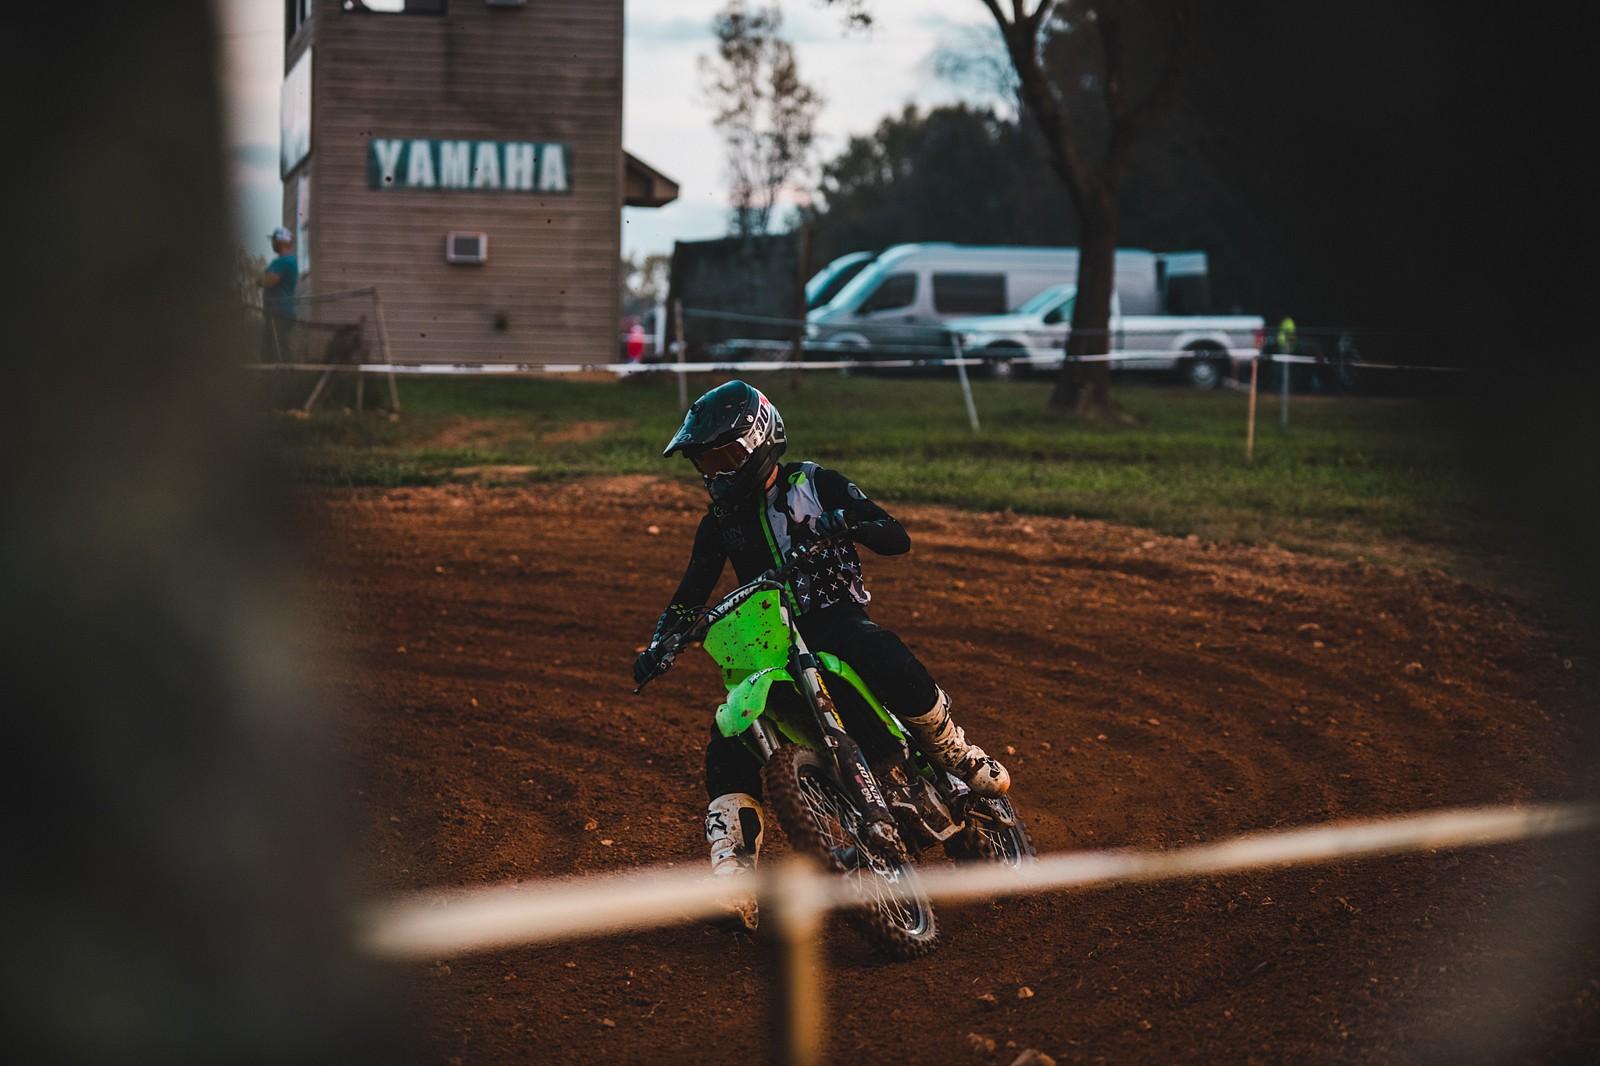 C74AEEDA-E70E-4325-A171-31A81FE2C759 - Reid Waddell - Motocross Pictures - Vital MX